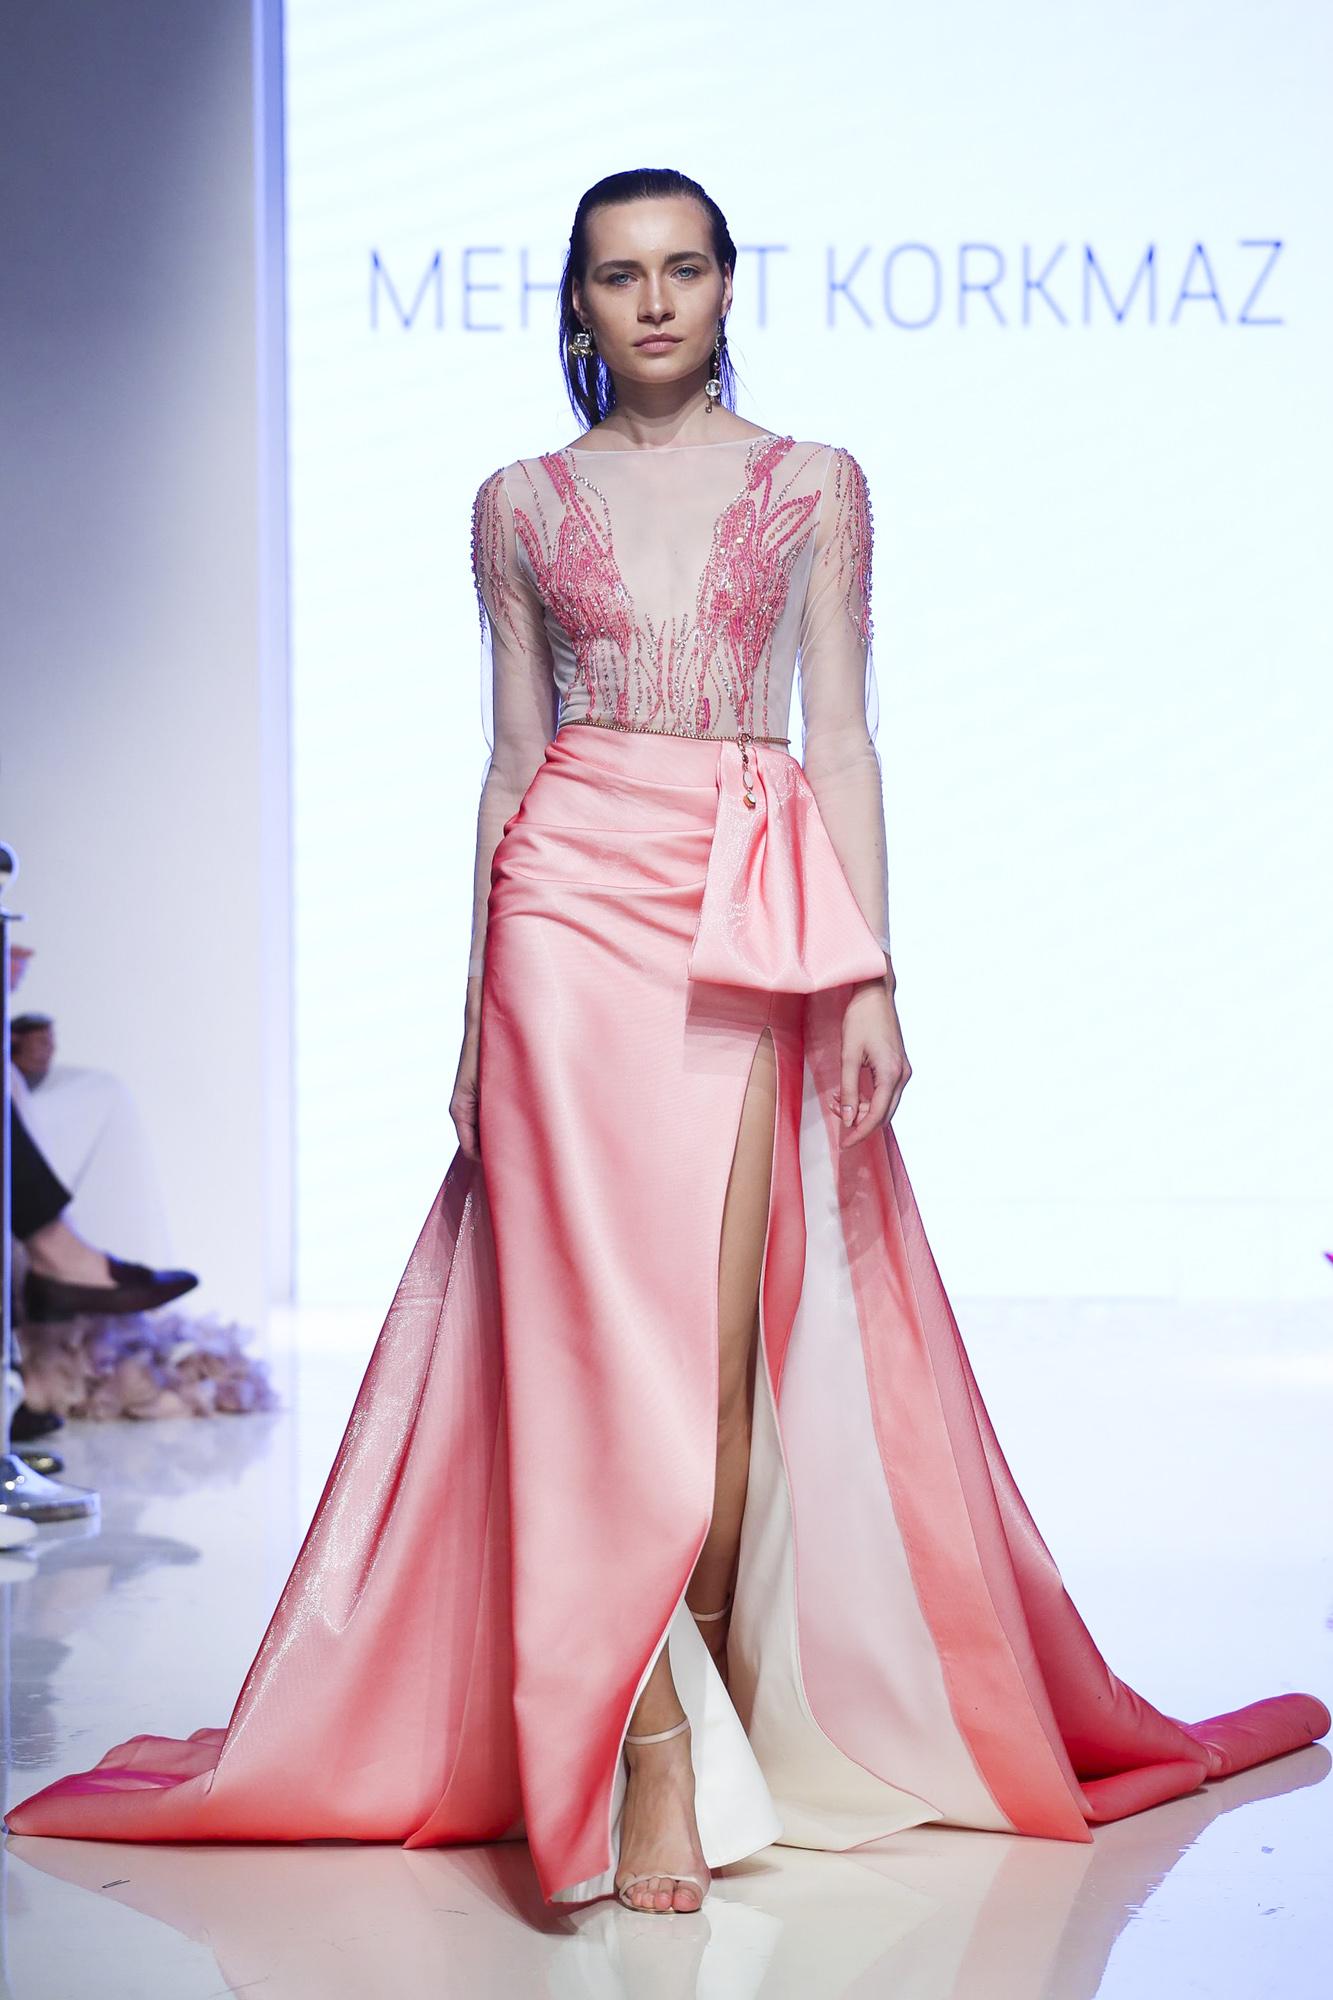 Mehmet Korkmaz fashion show, Arab Fashion Week collection Spring Summer 2020 in Dubai